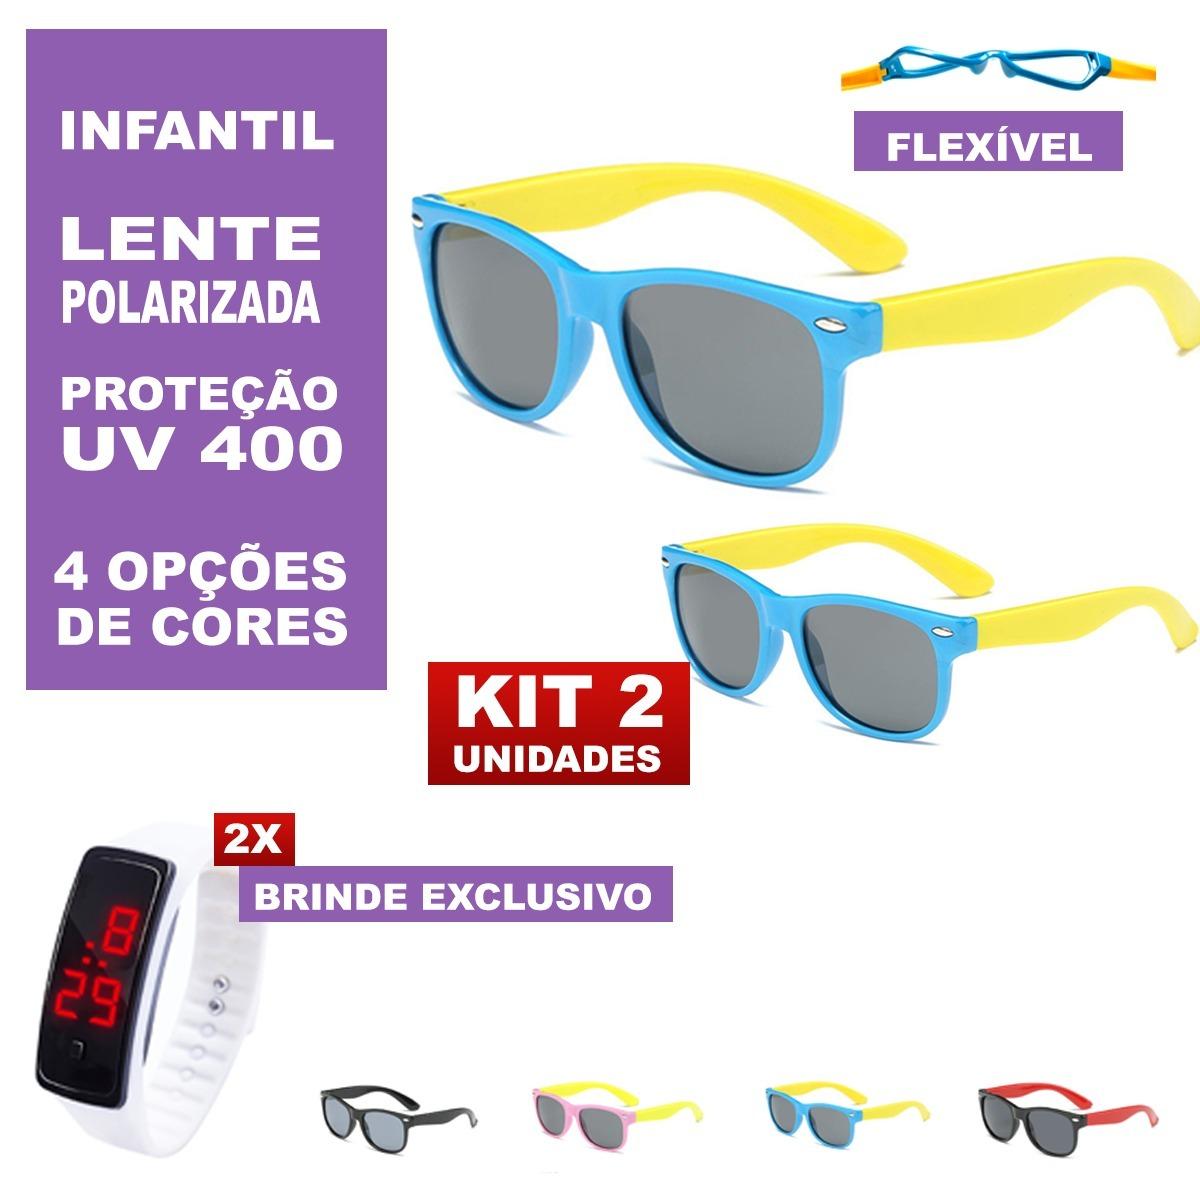 9ddb7ae3a1cd6 combo 2 óculos infantis flexíveis uv400 + 2 brindes. Carregando zoom.